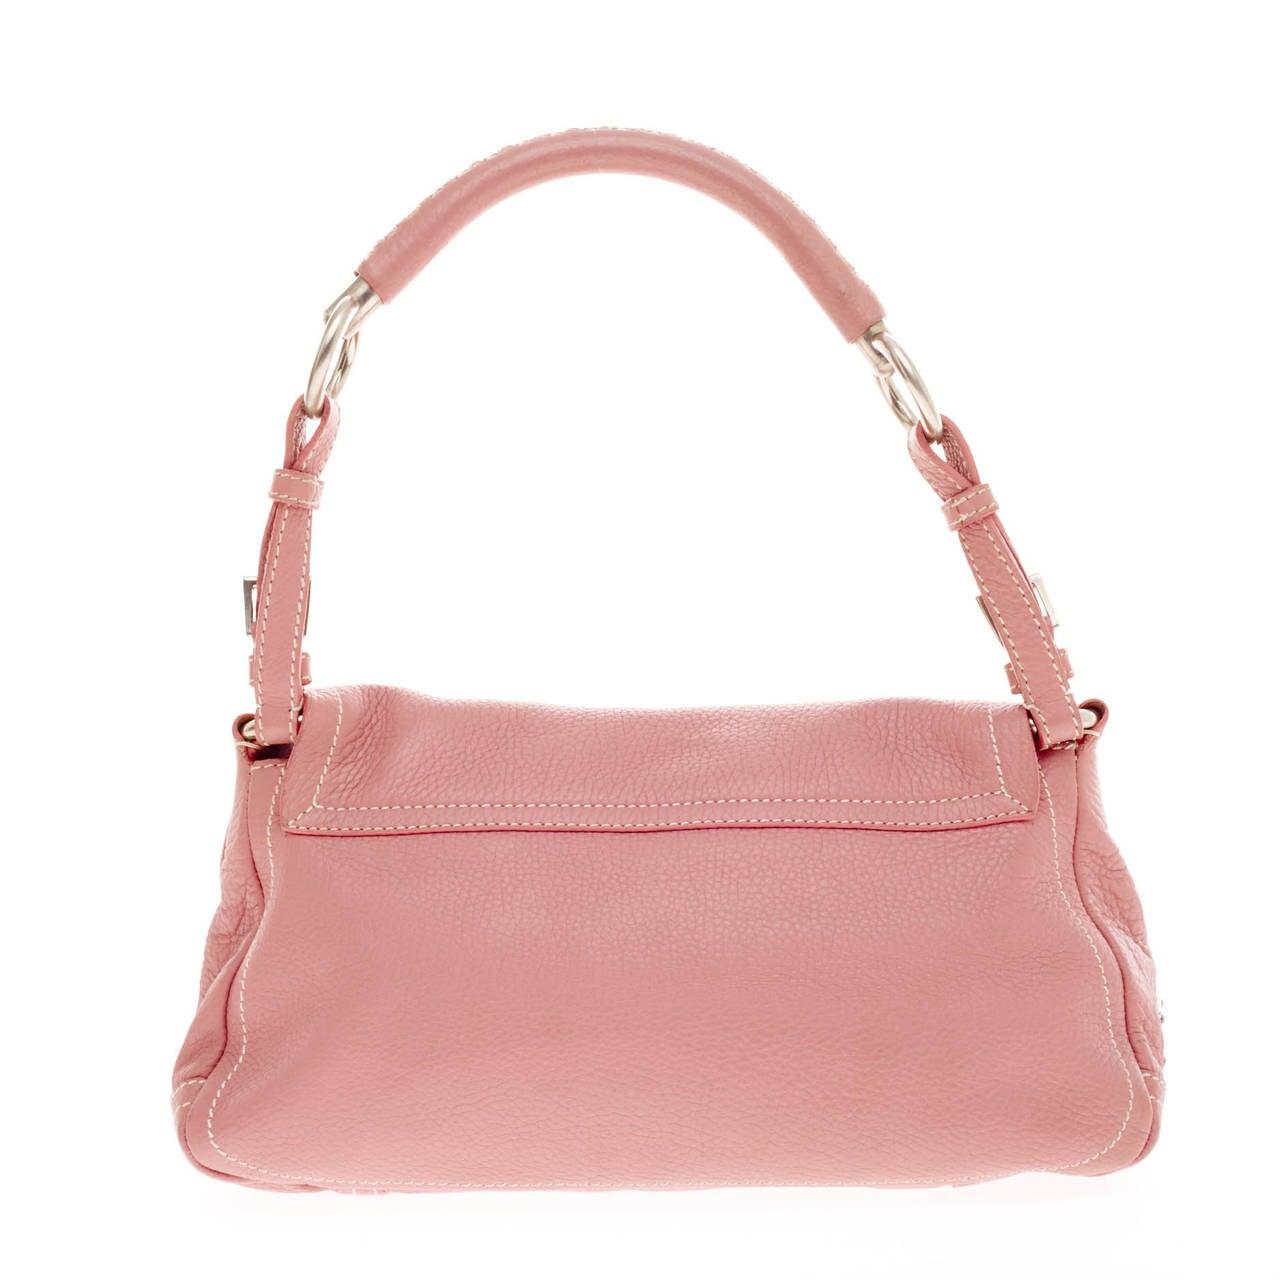 replica handbags thailand - prada vitello daino flap bag, cheap prada bags for sale